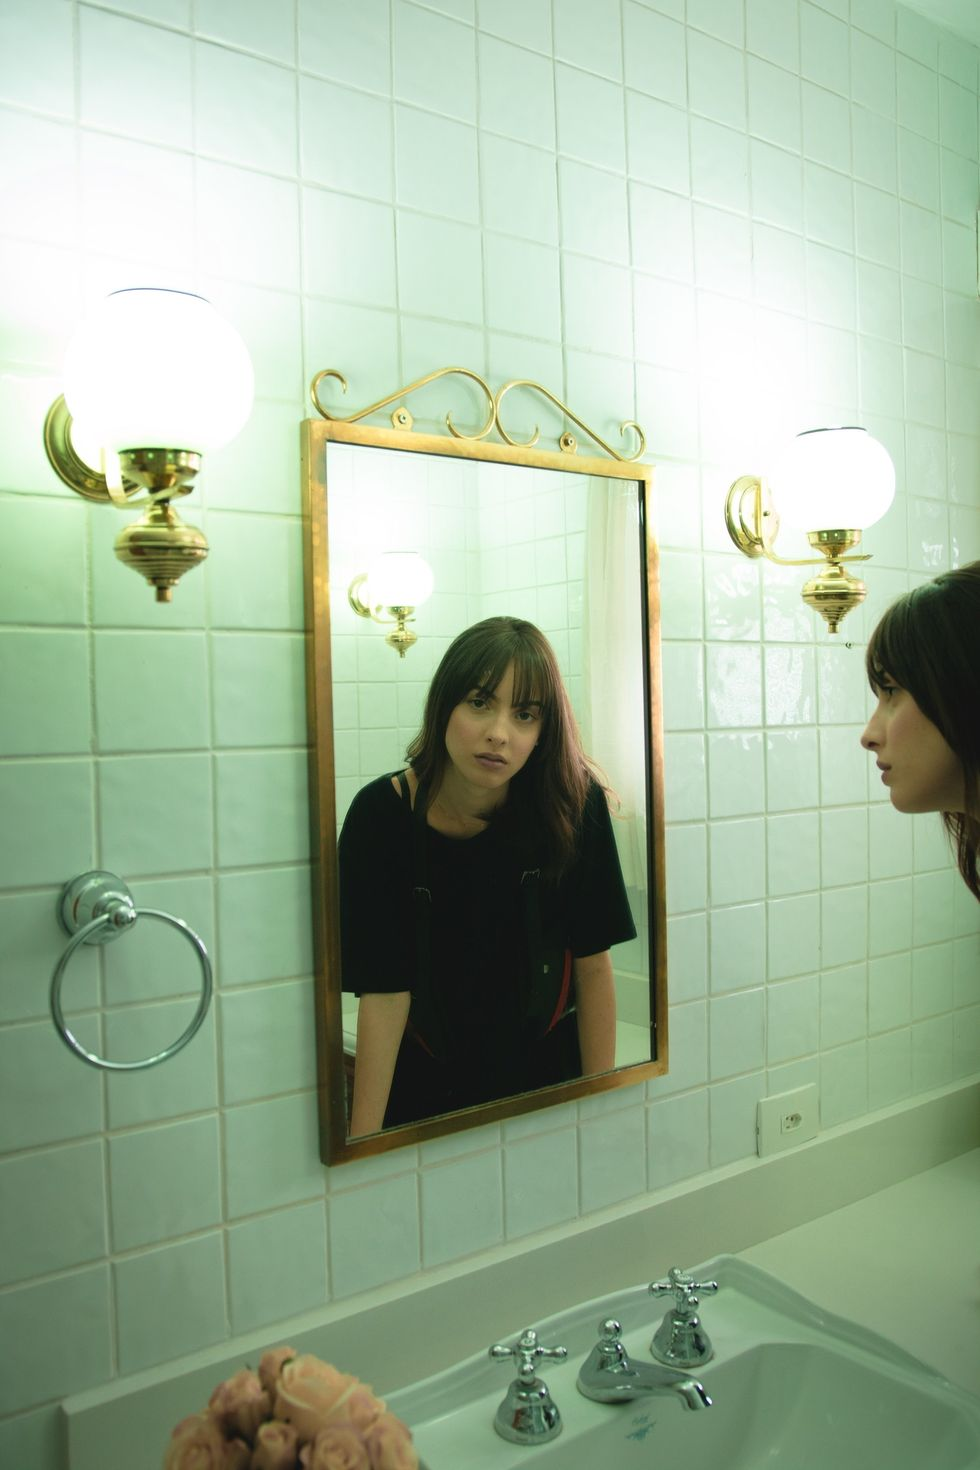 https://www.pexels.com/photo/woman-in-black-t-shirt-staring-on-wall-mirror-2043599/